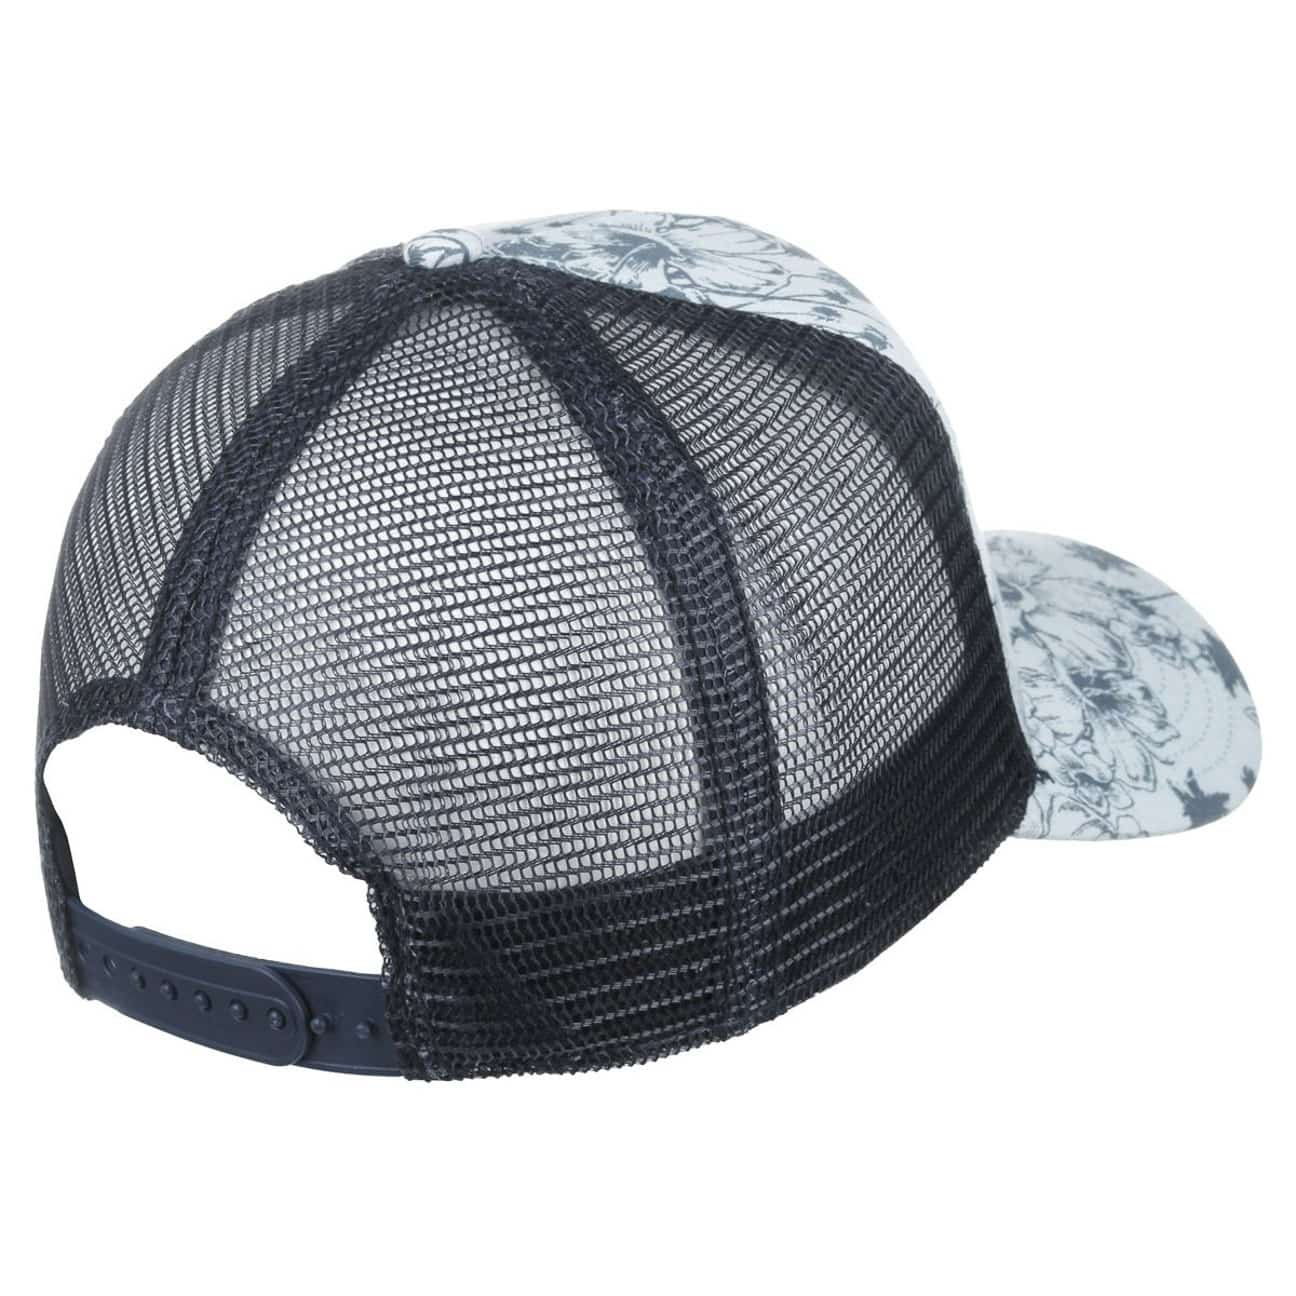 hft canvas palm trucker cap by djinns eur 21 99 hats. Black Bedroom Furniture Sets. Home Design Ideas